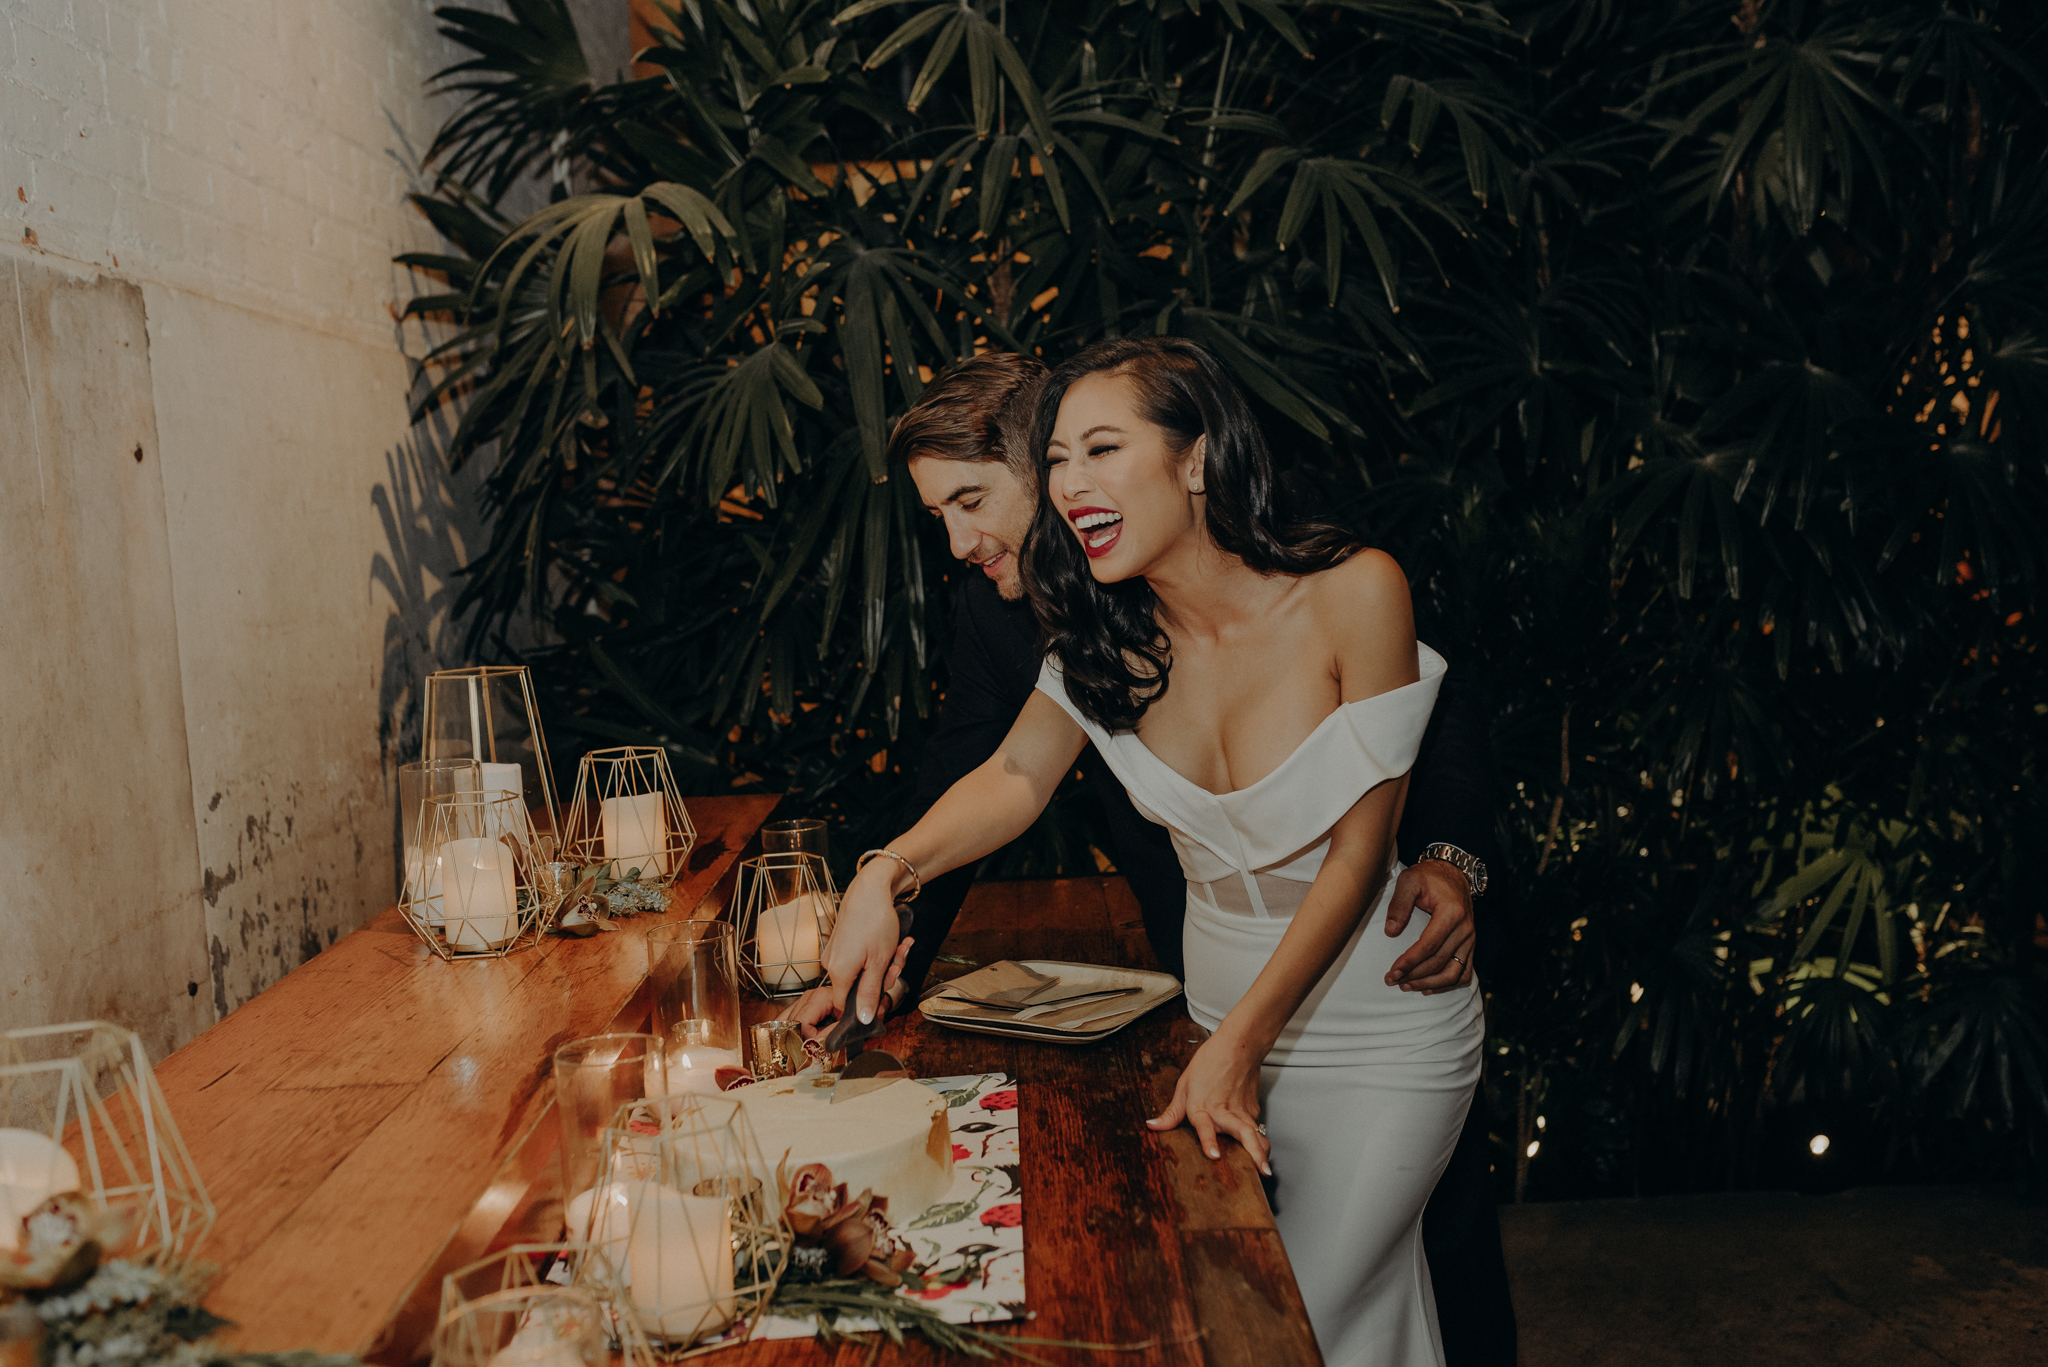 Wedding Photo LA - wedding photographer in los angeles - millwick wedding venue -isaiahandtaylor.com-133.jpg